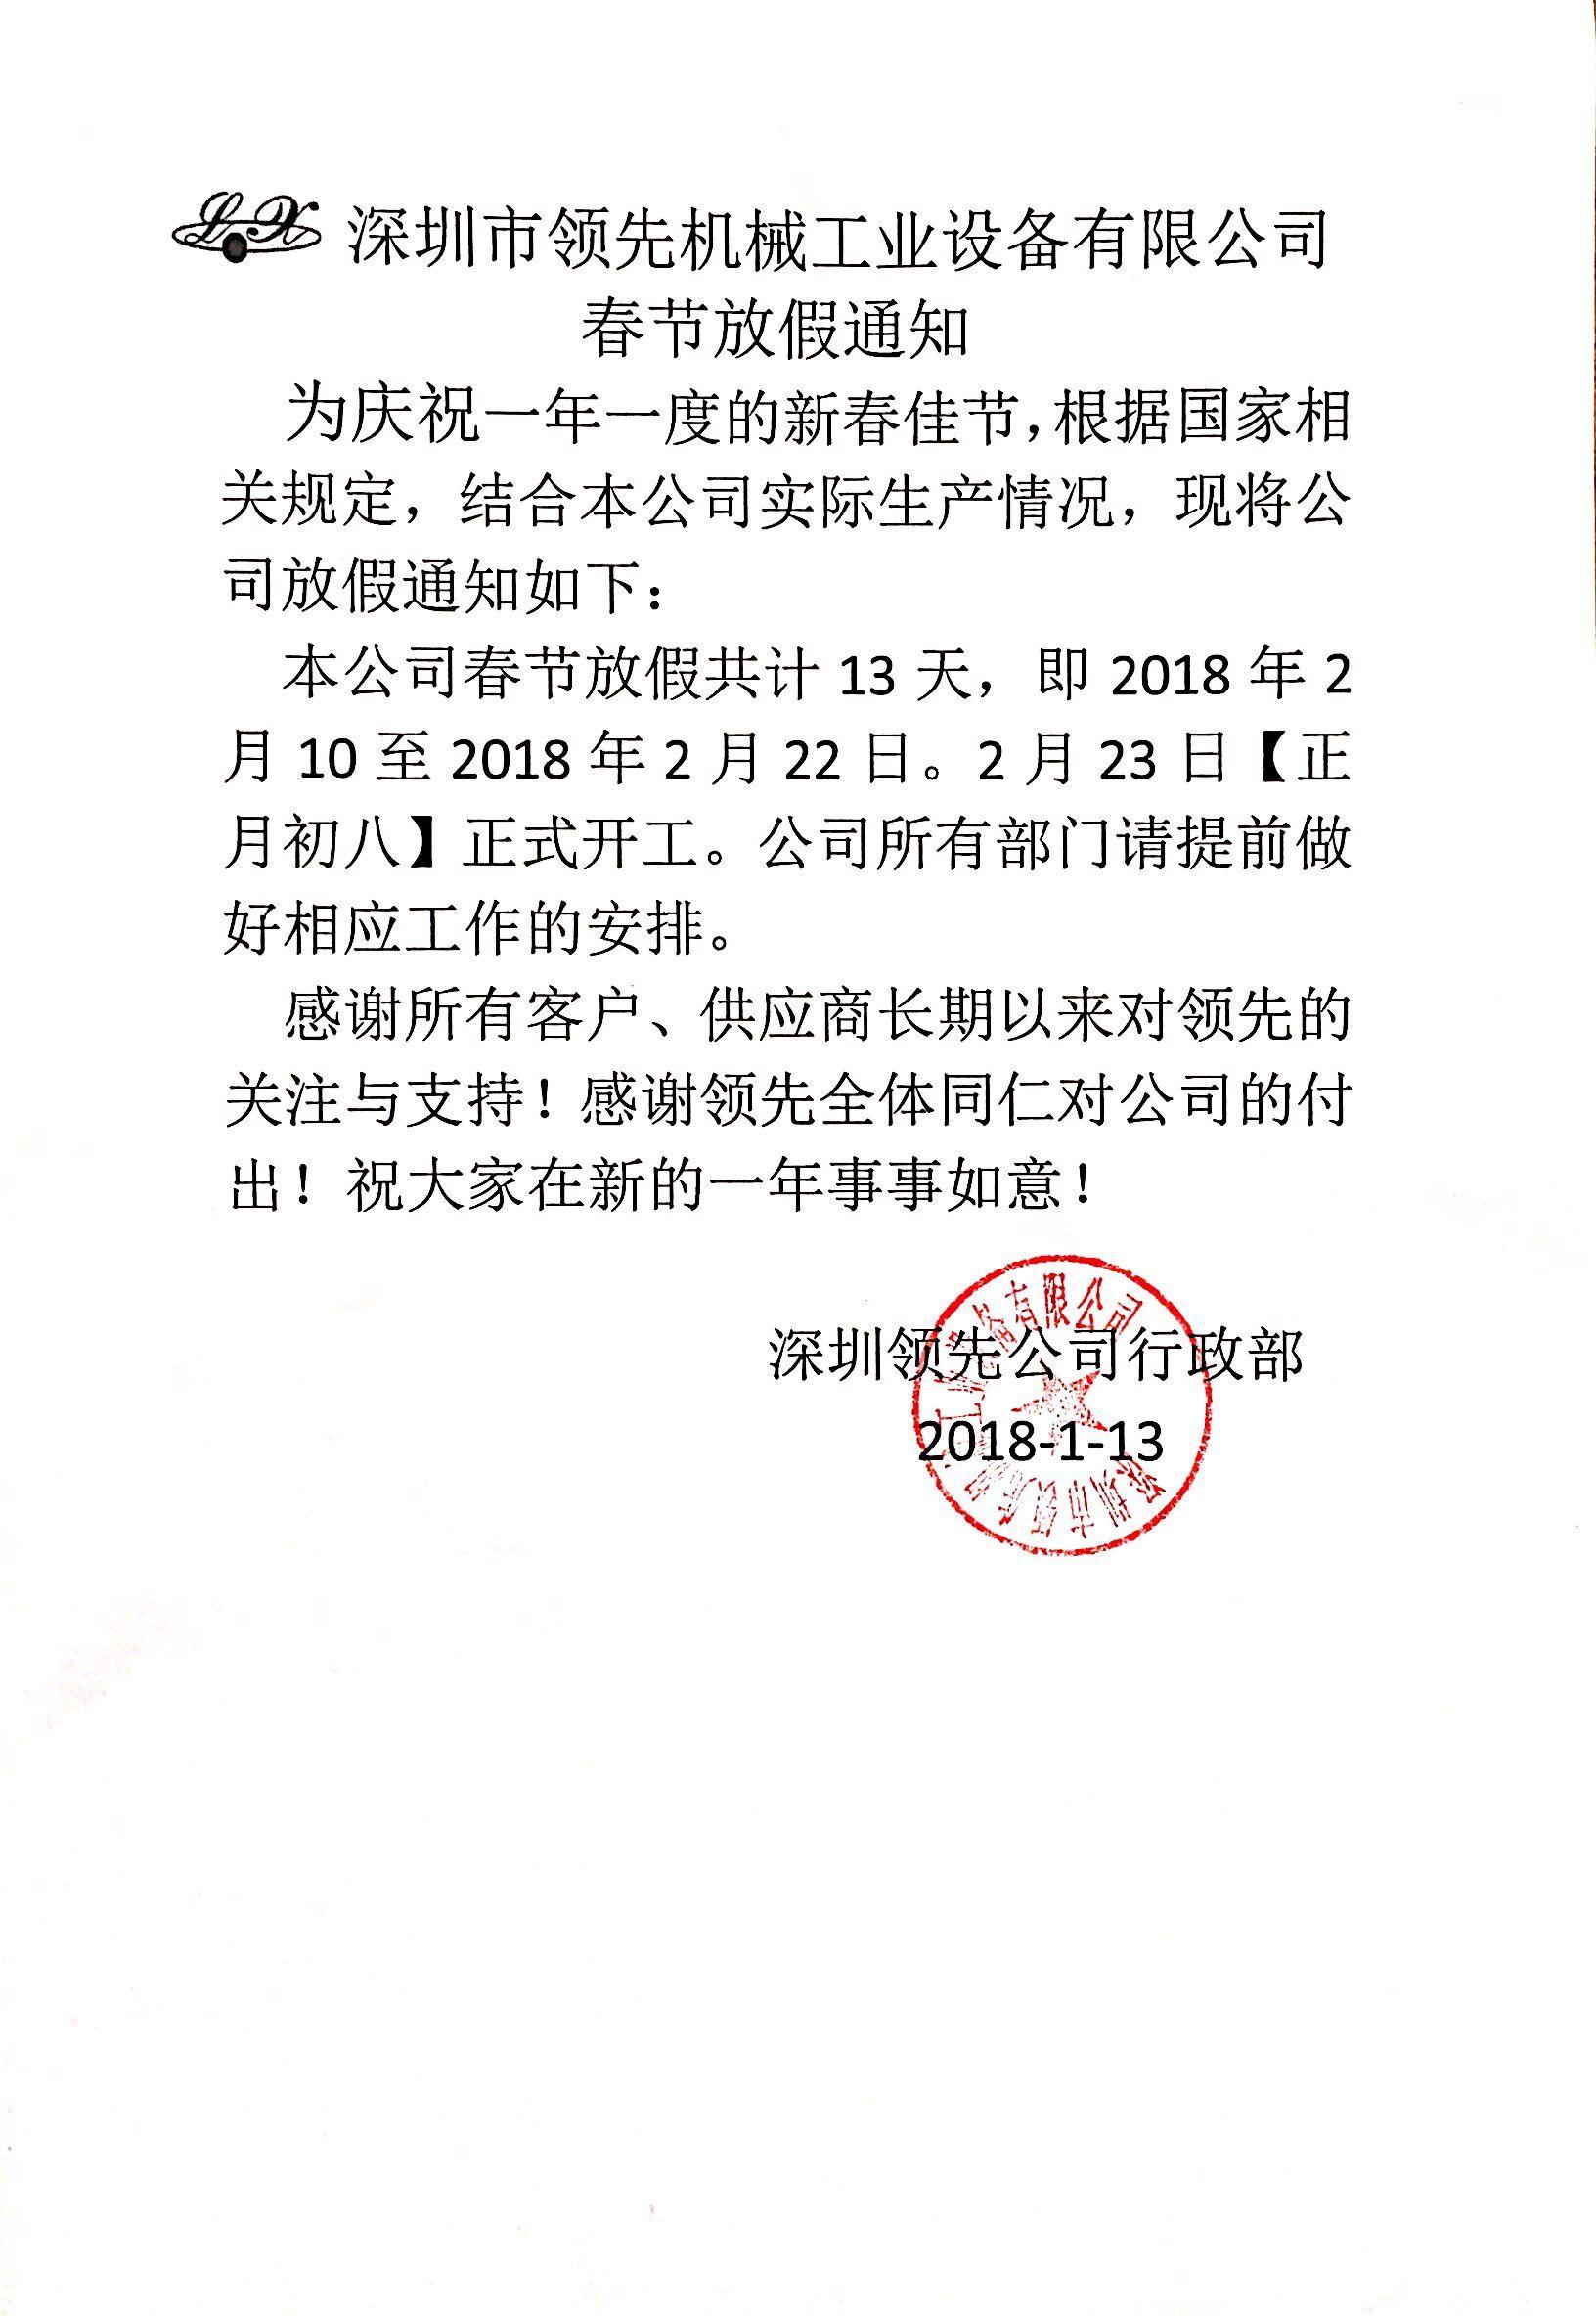 pk10计划人工计划-pk10注册38-pk10开户注册平台2018年春节放假通知